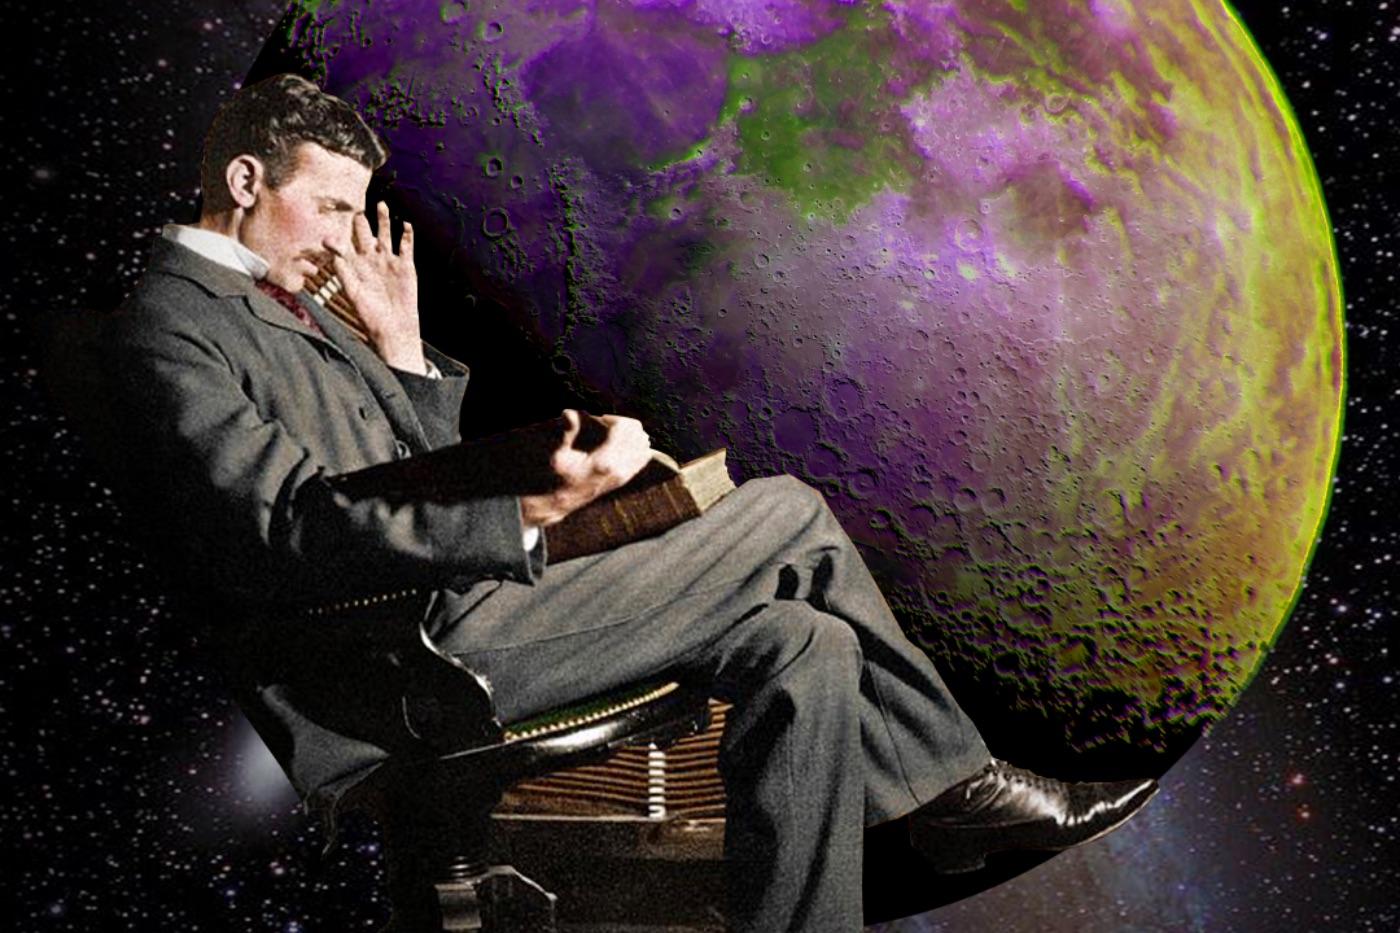 Nikola Tesla's kinetic experiments